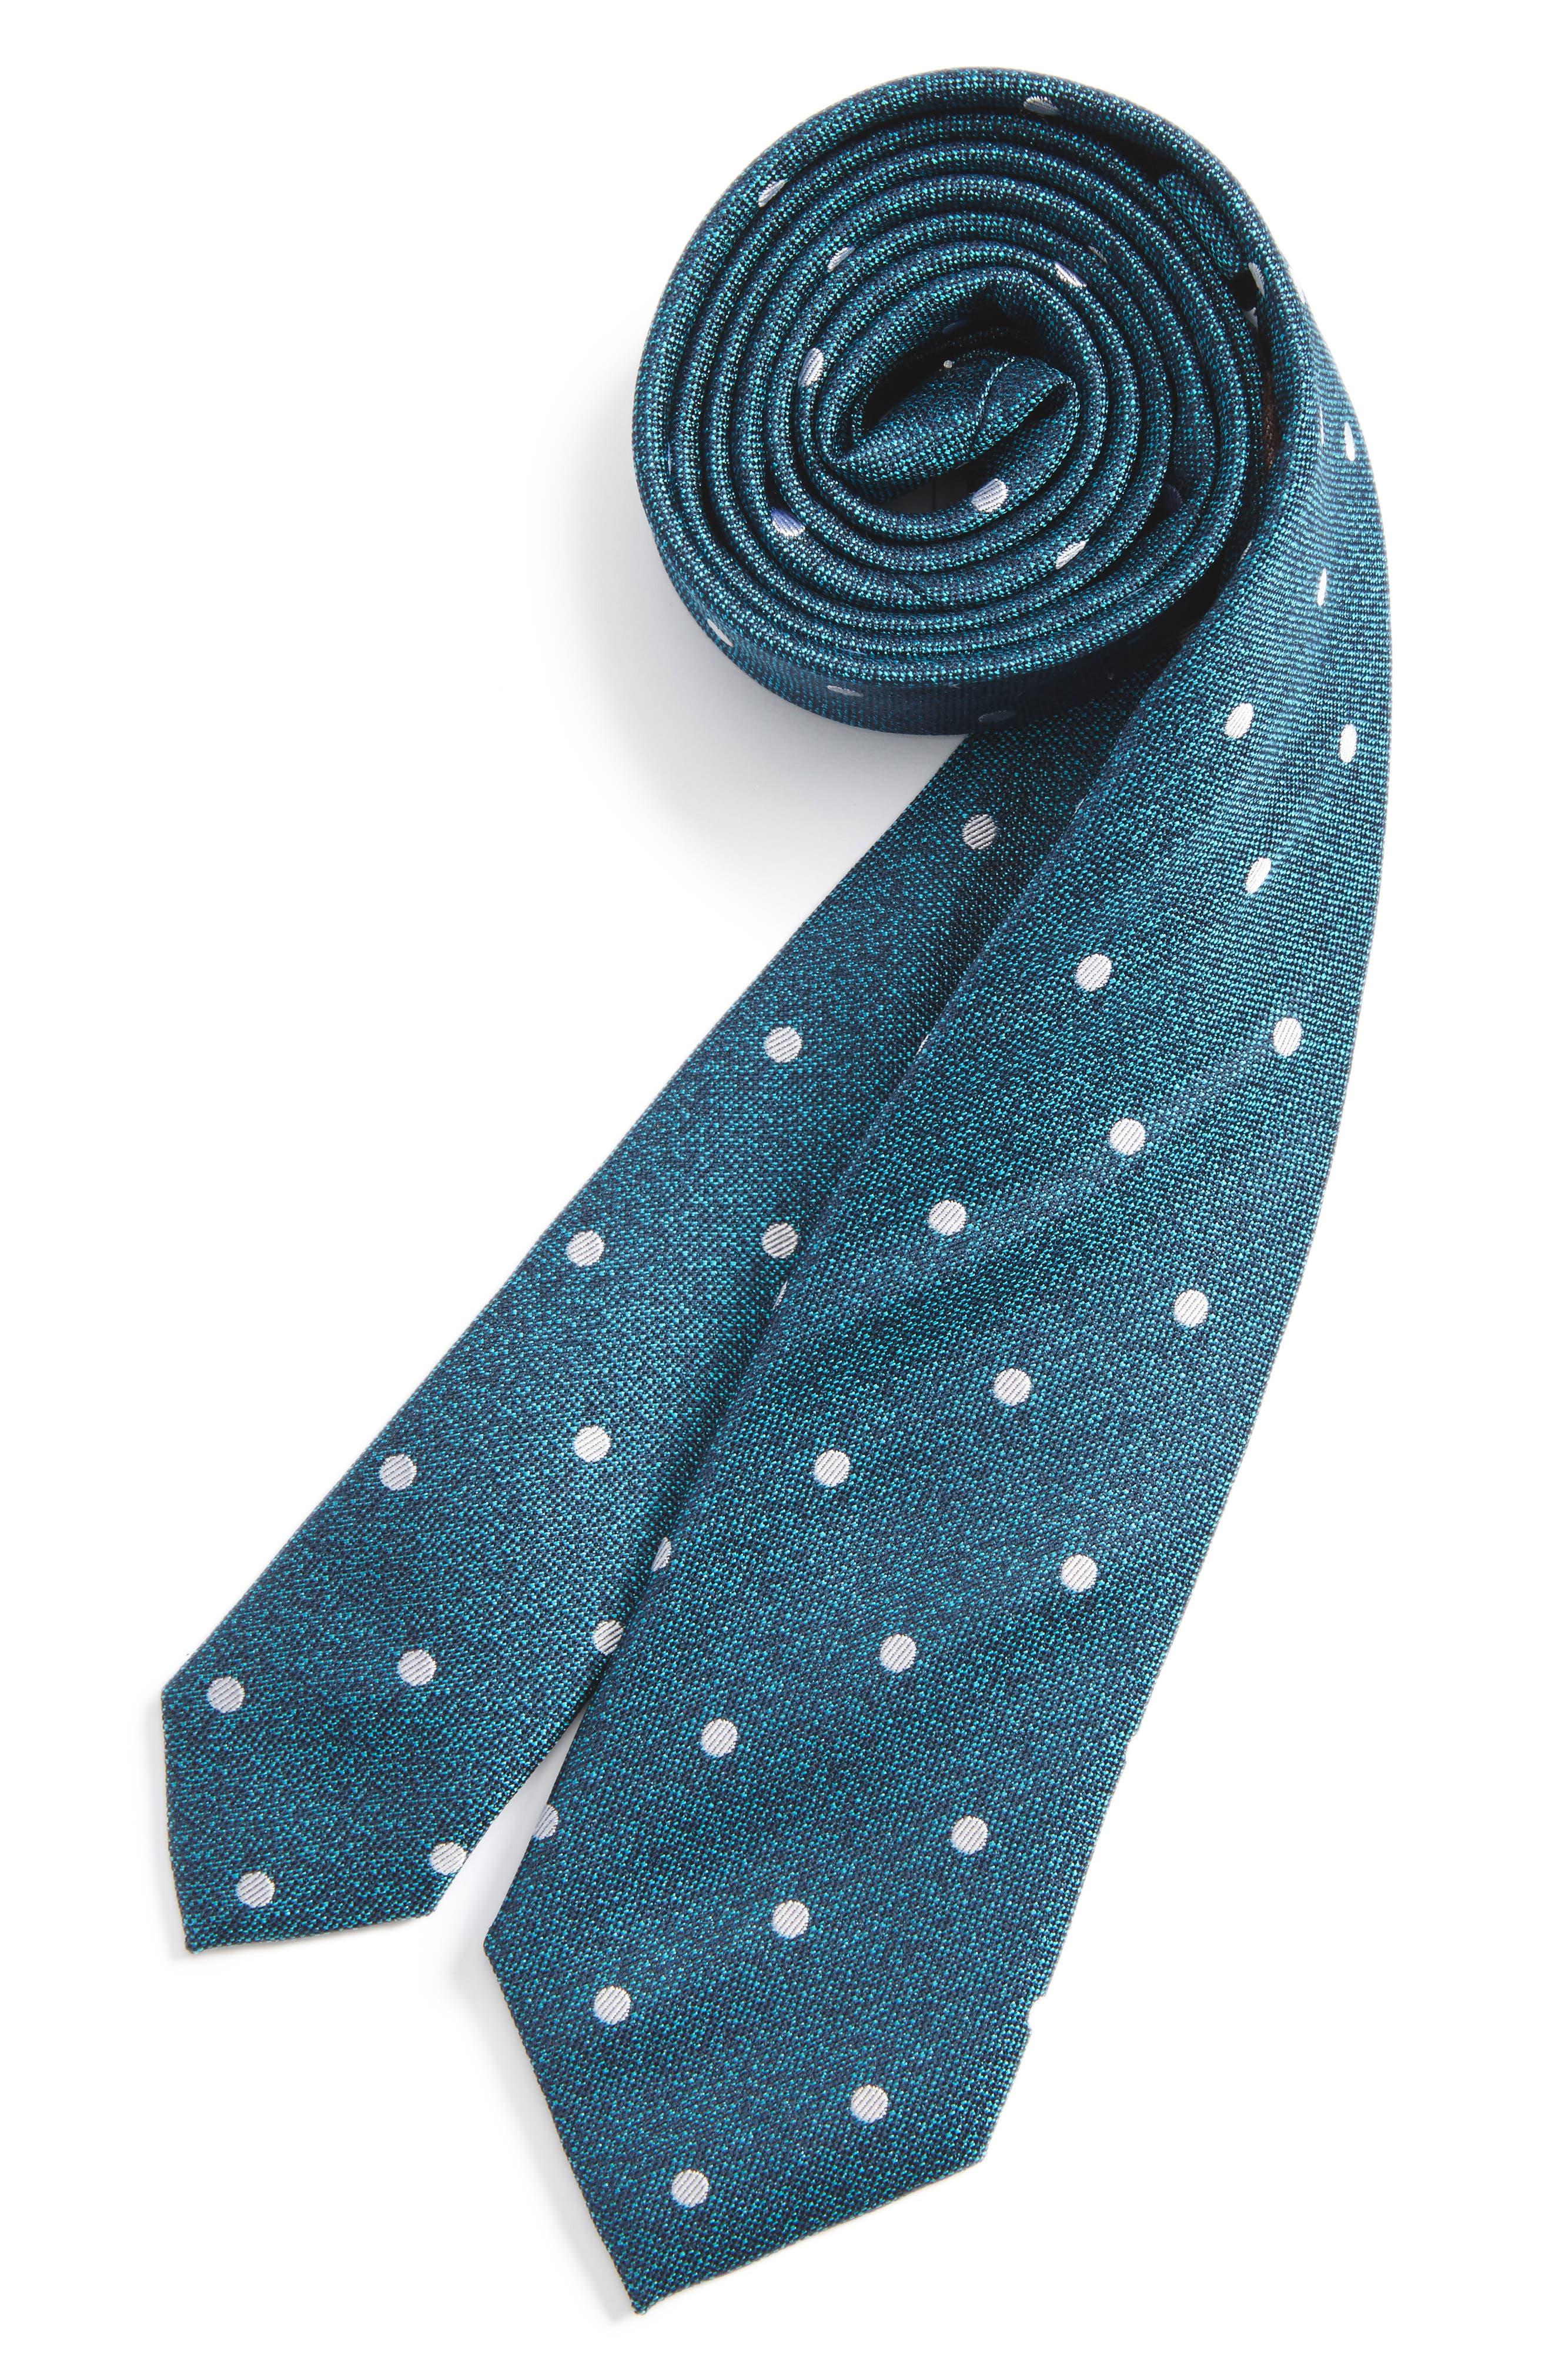 MICHAEL KORS Dot Silk Tie